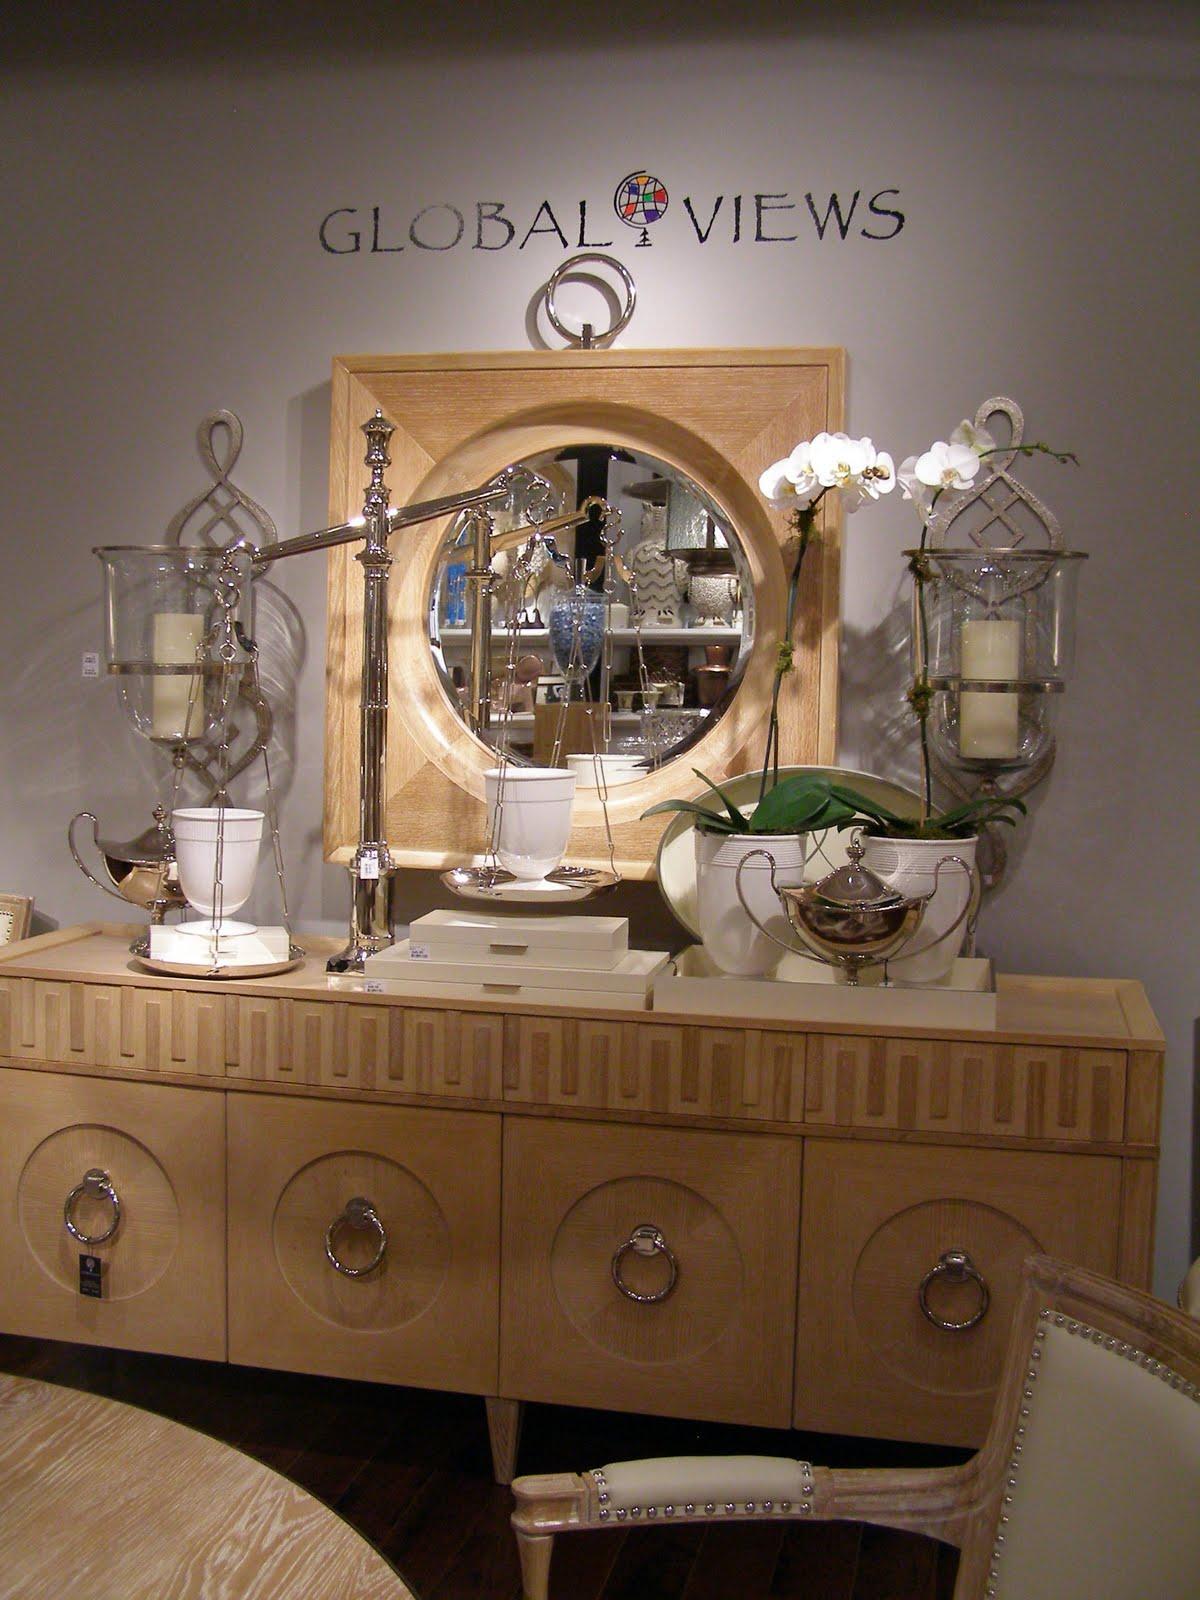 E's Cup of Tea Dallas Market, Global Views Showroom